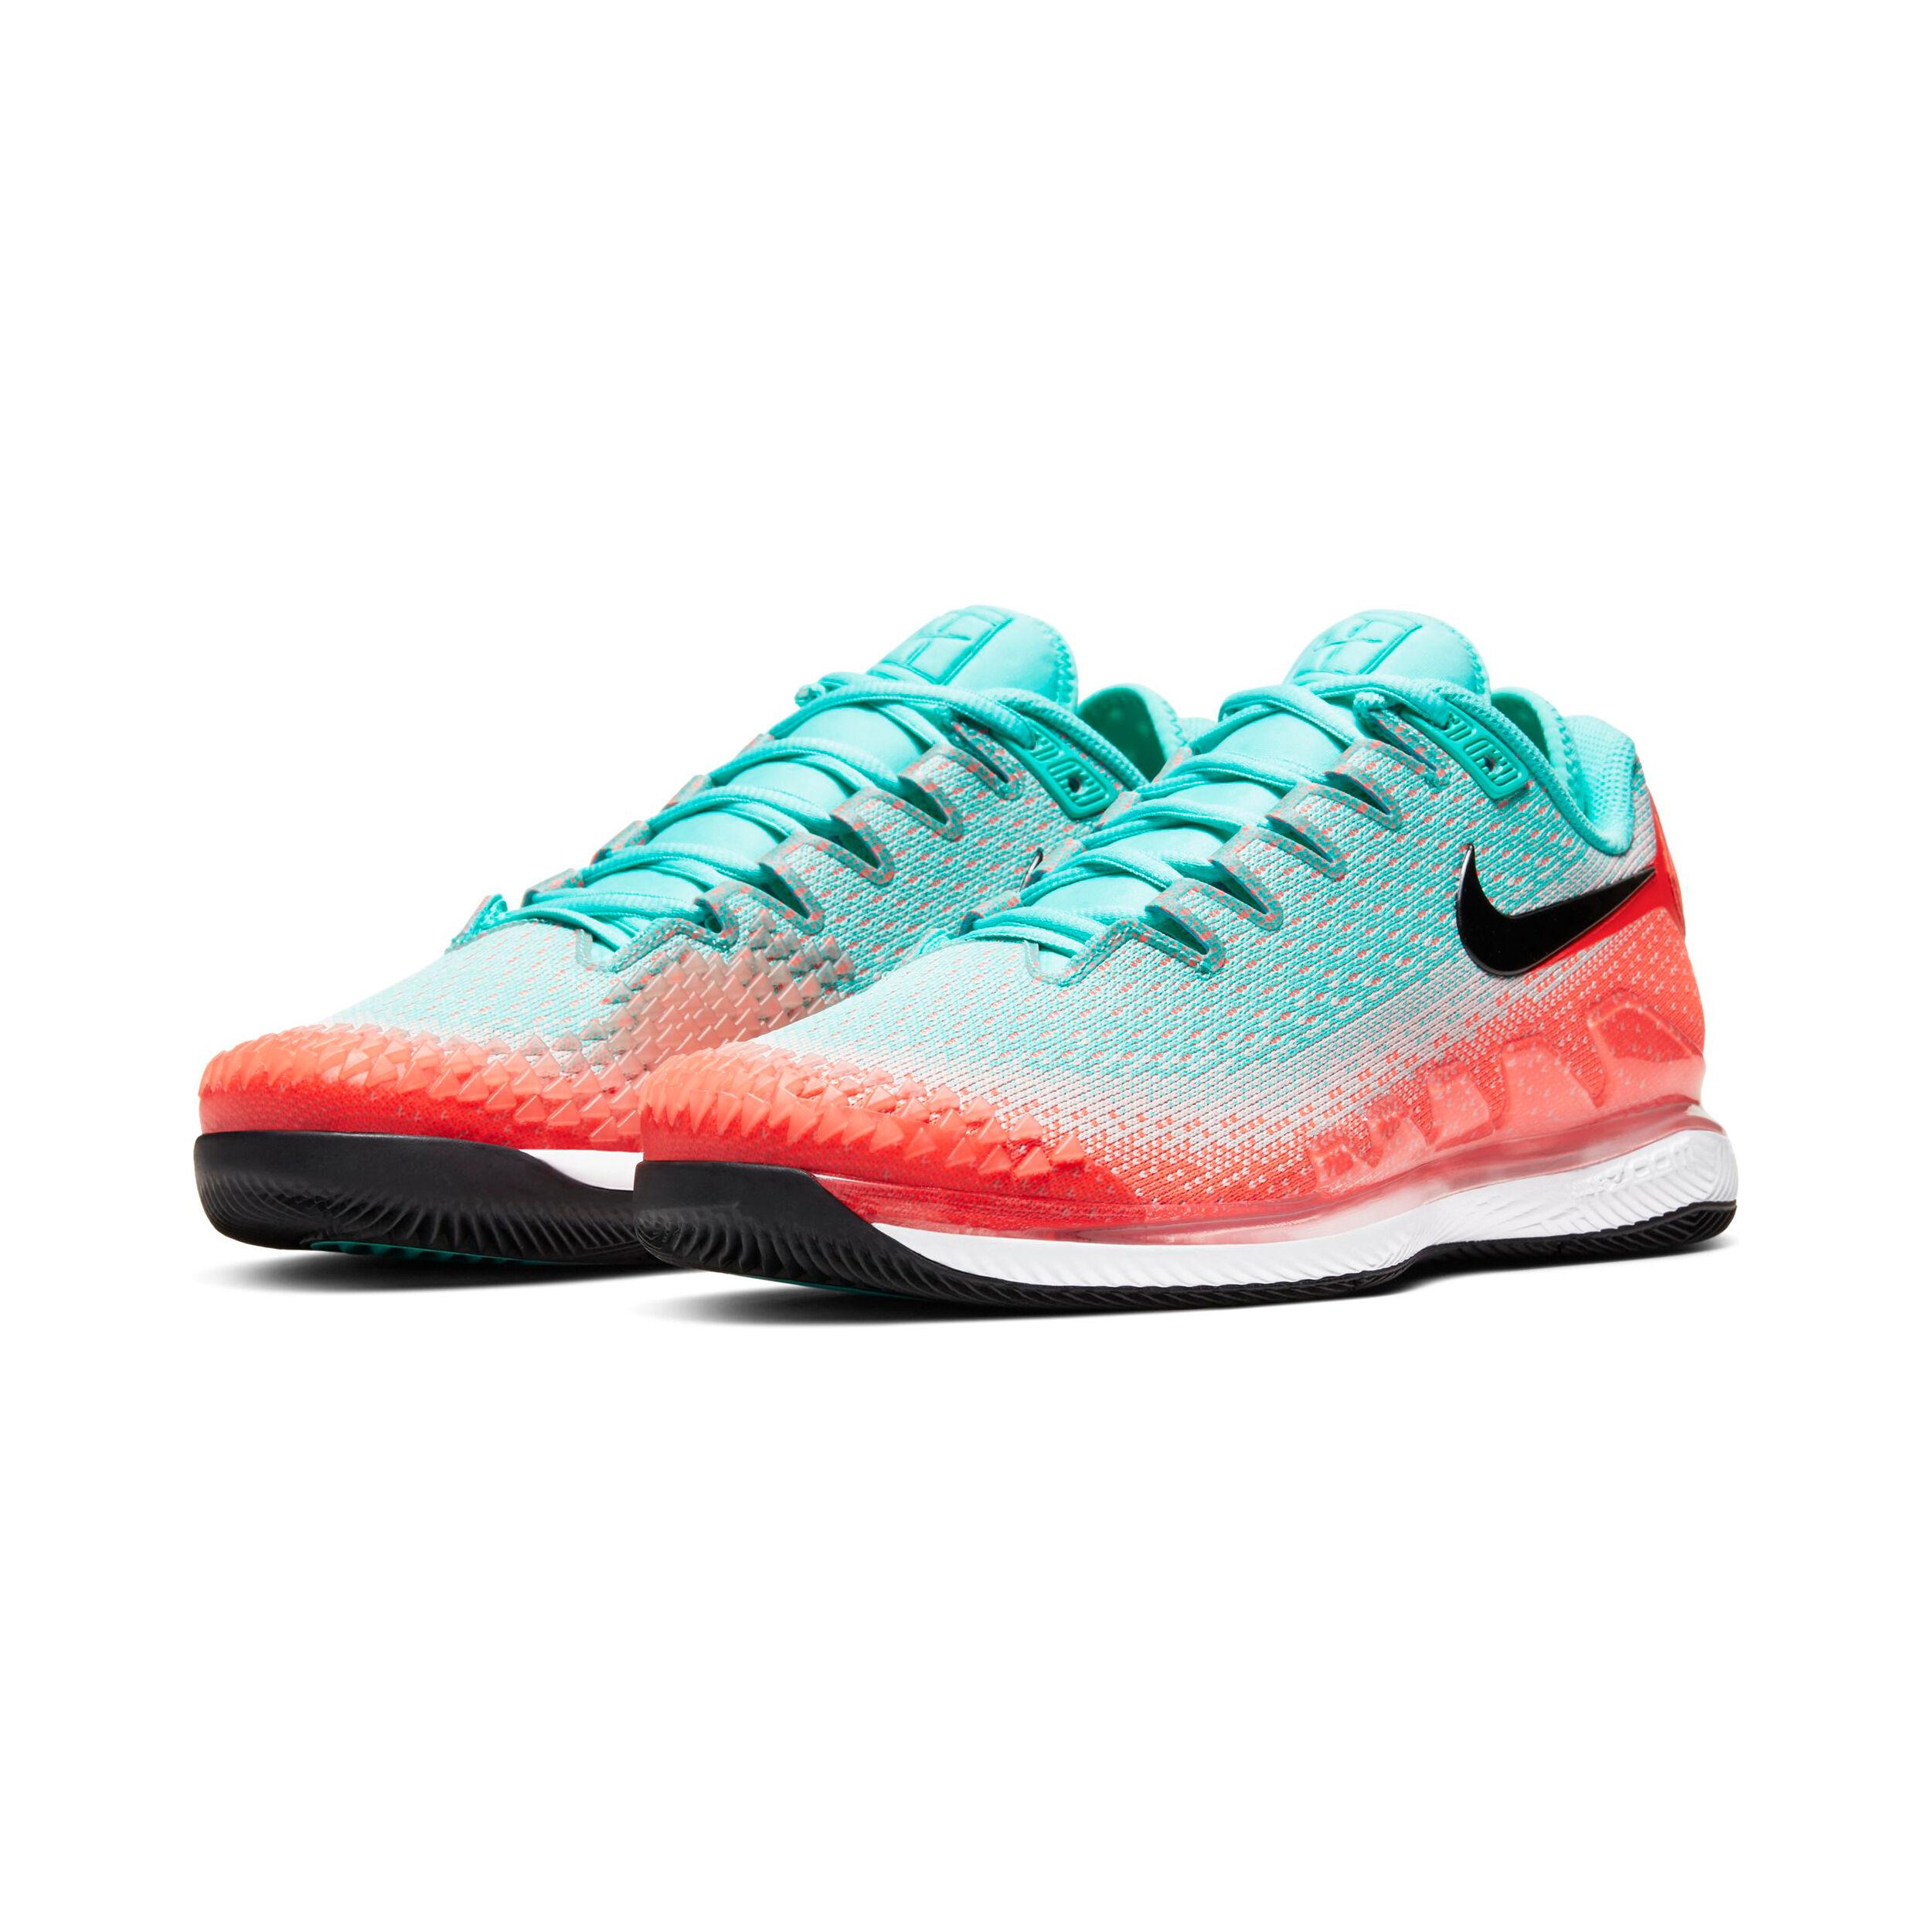 buy Nike Air Zoom Vapor X Knit All Court Shoe Men - Turquoise ...